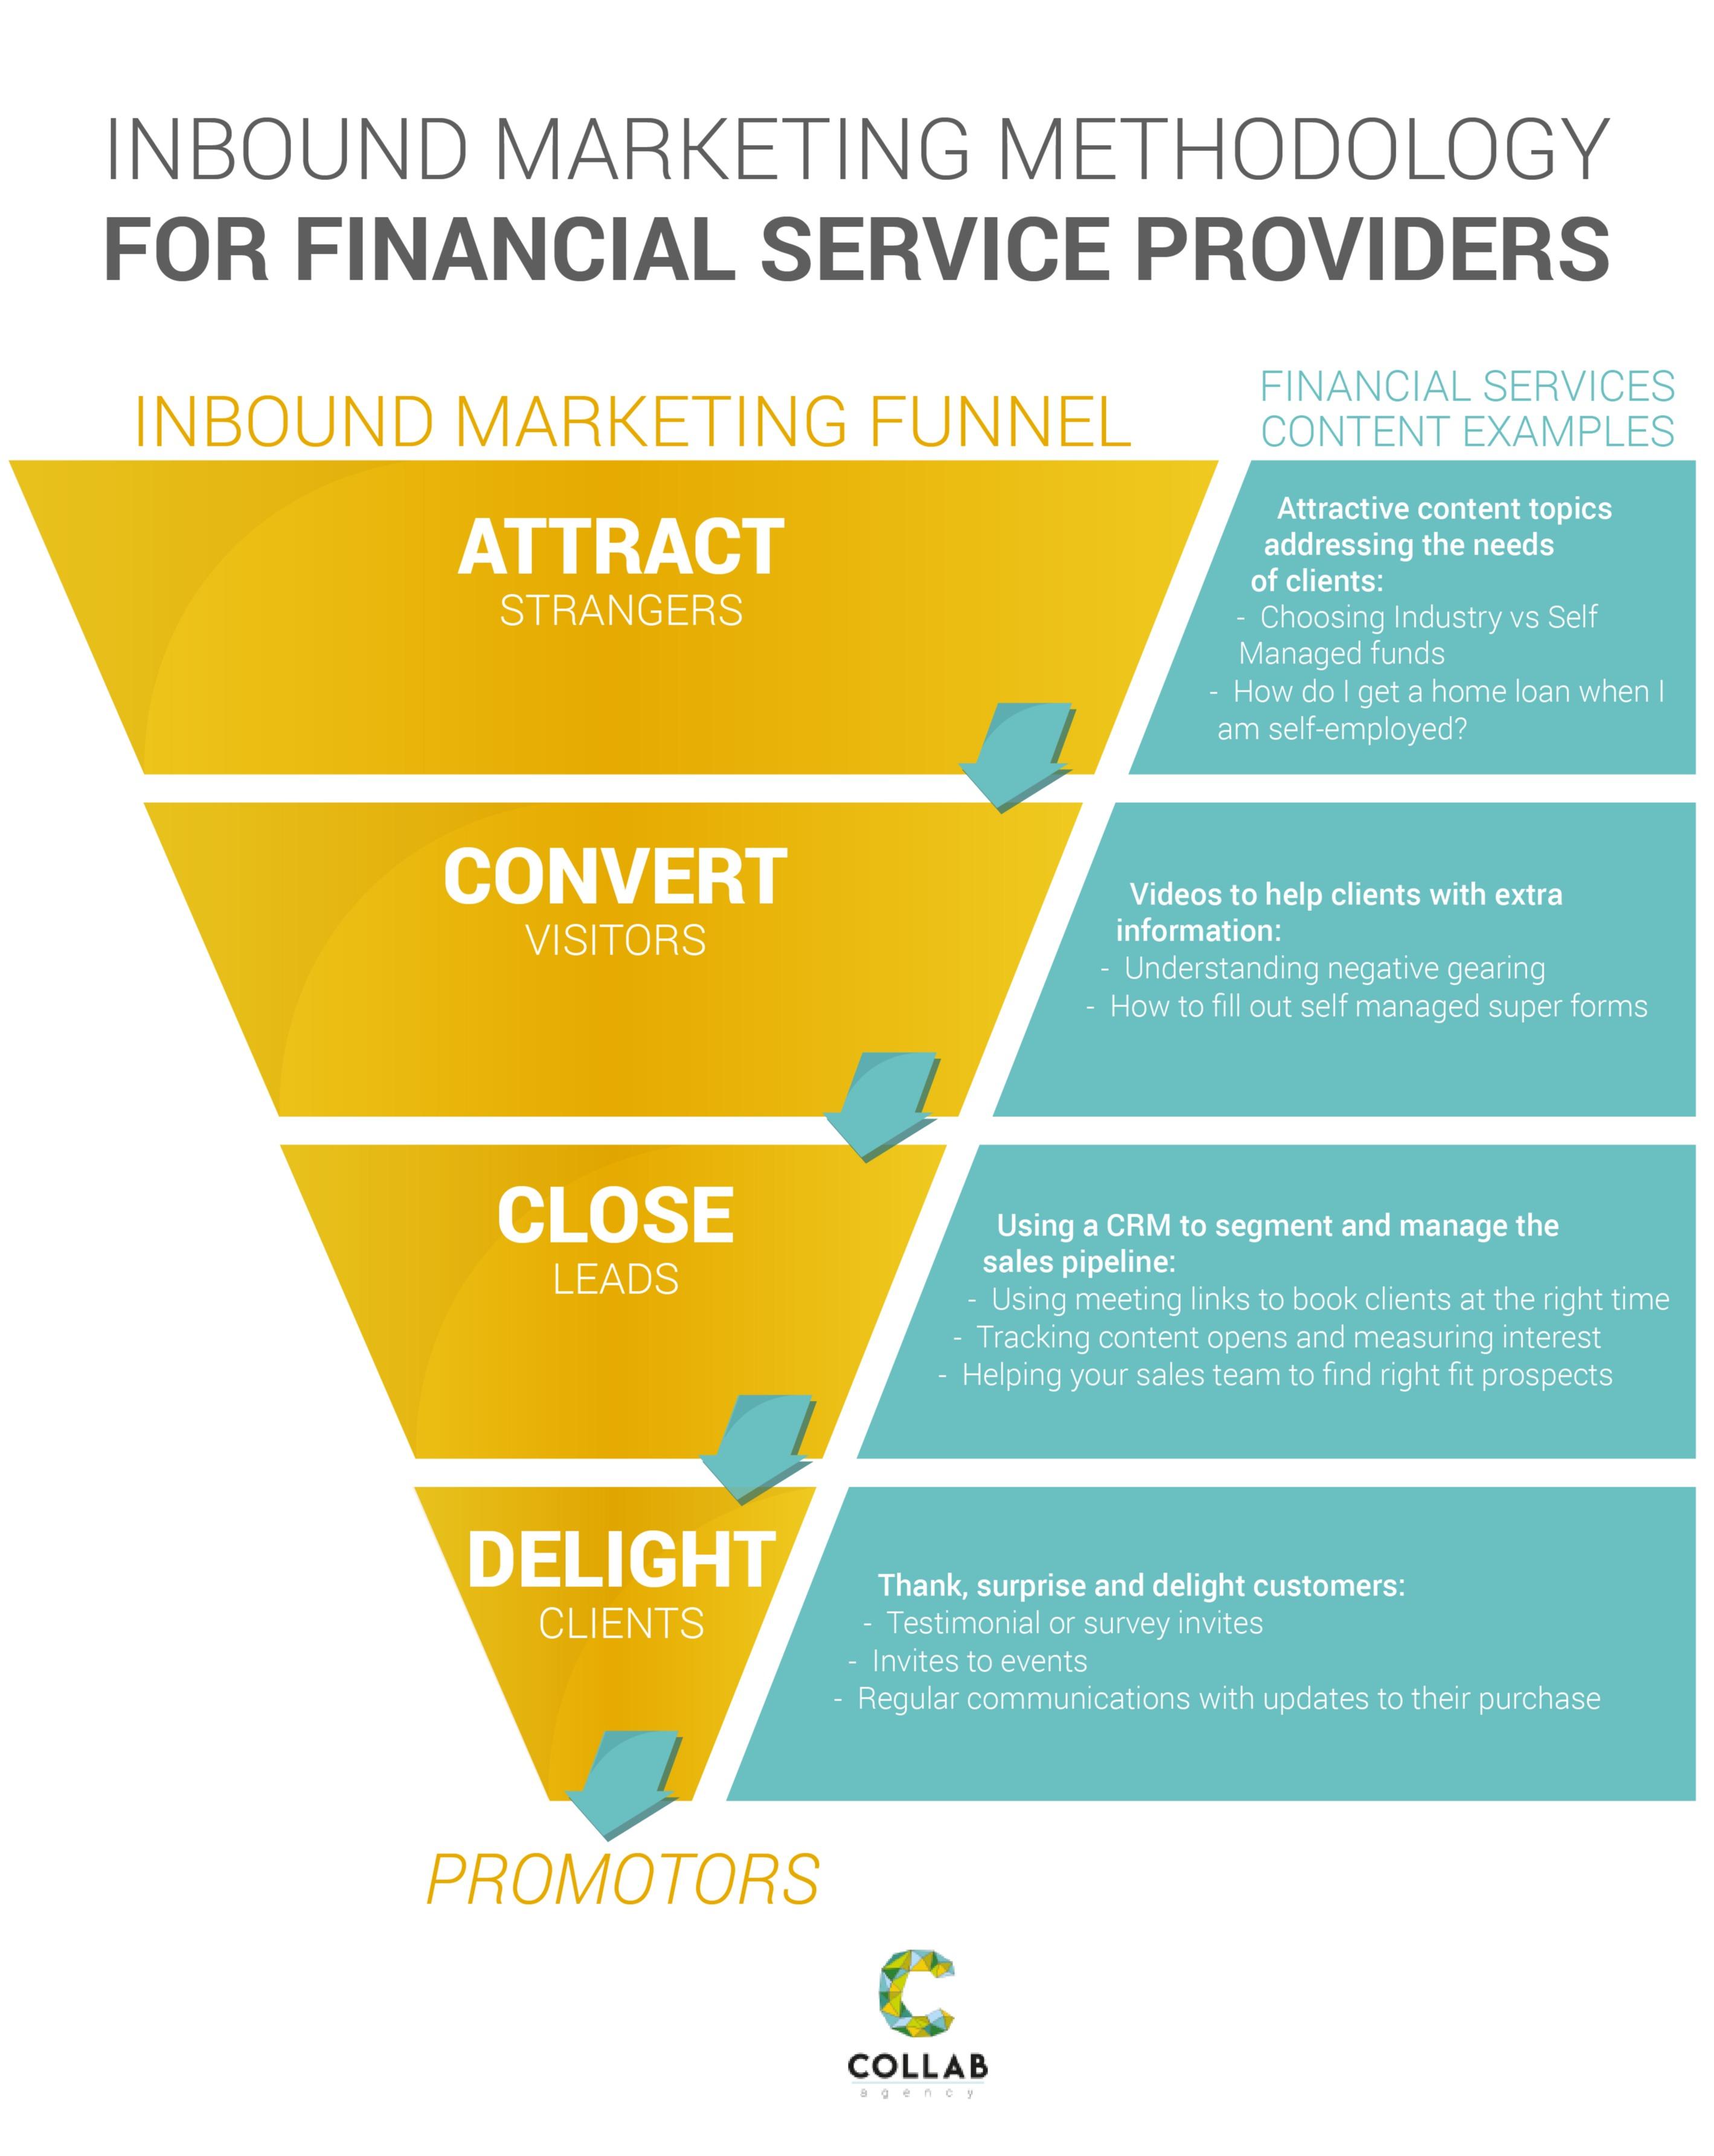 Fin services funnel-03 (3)